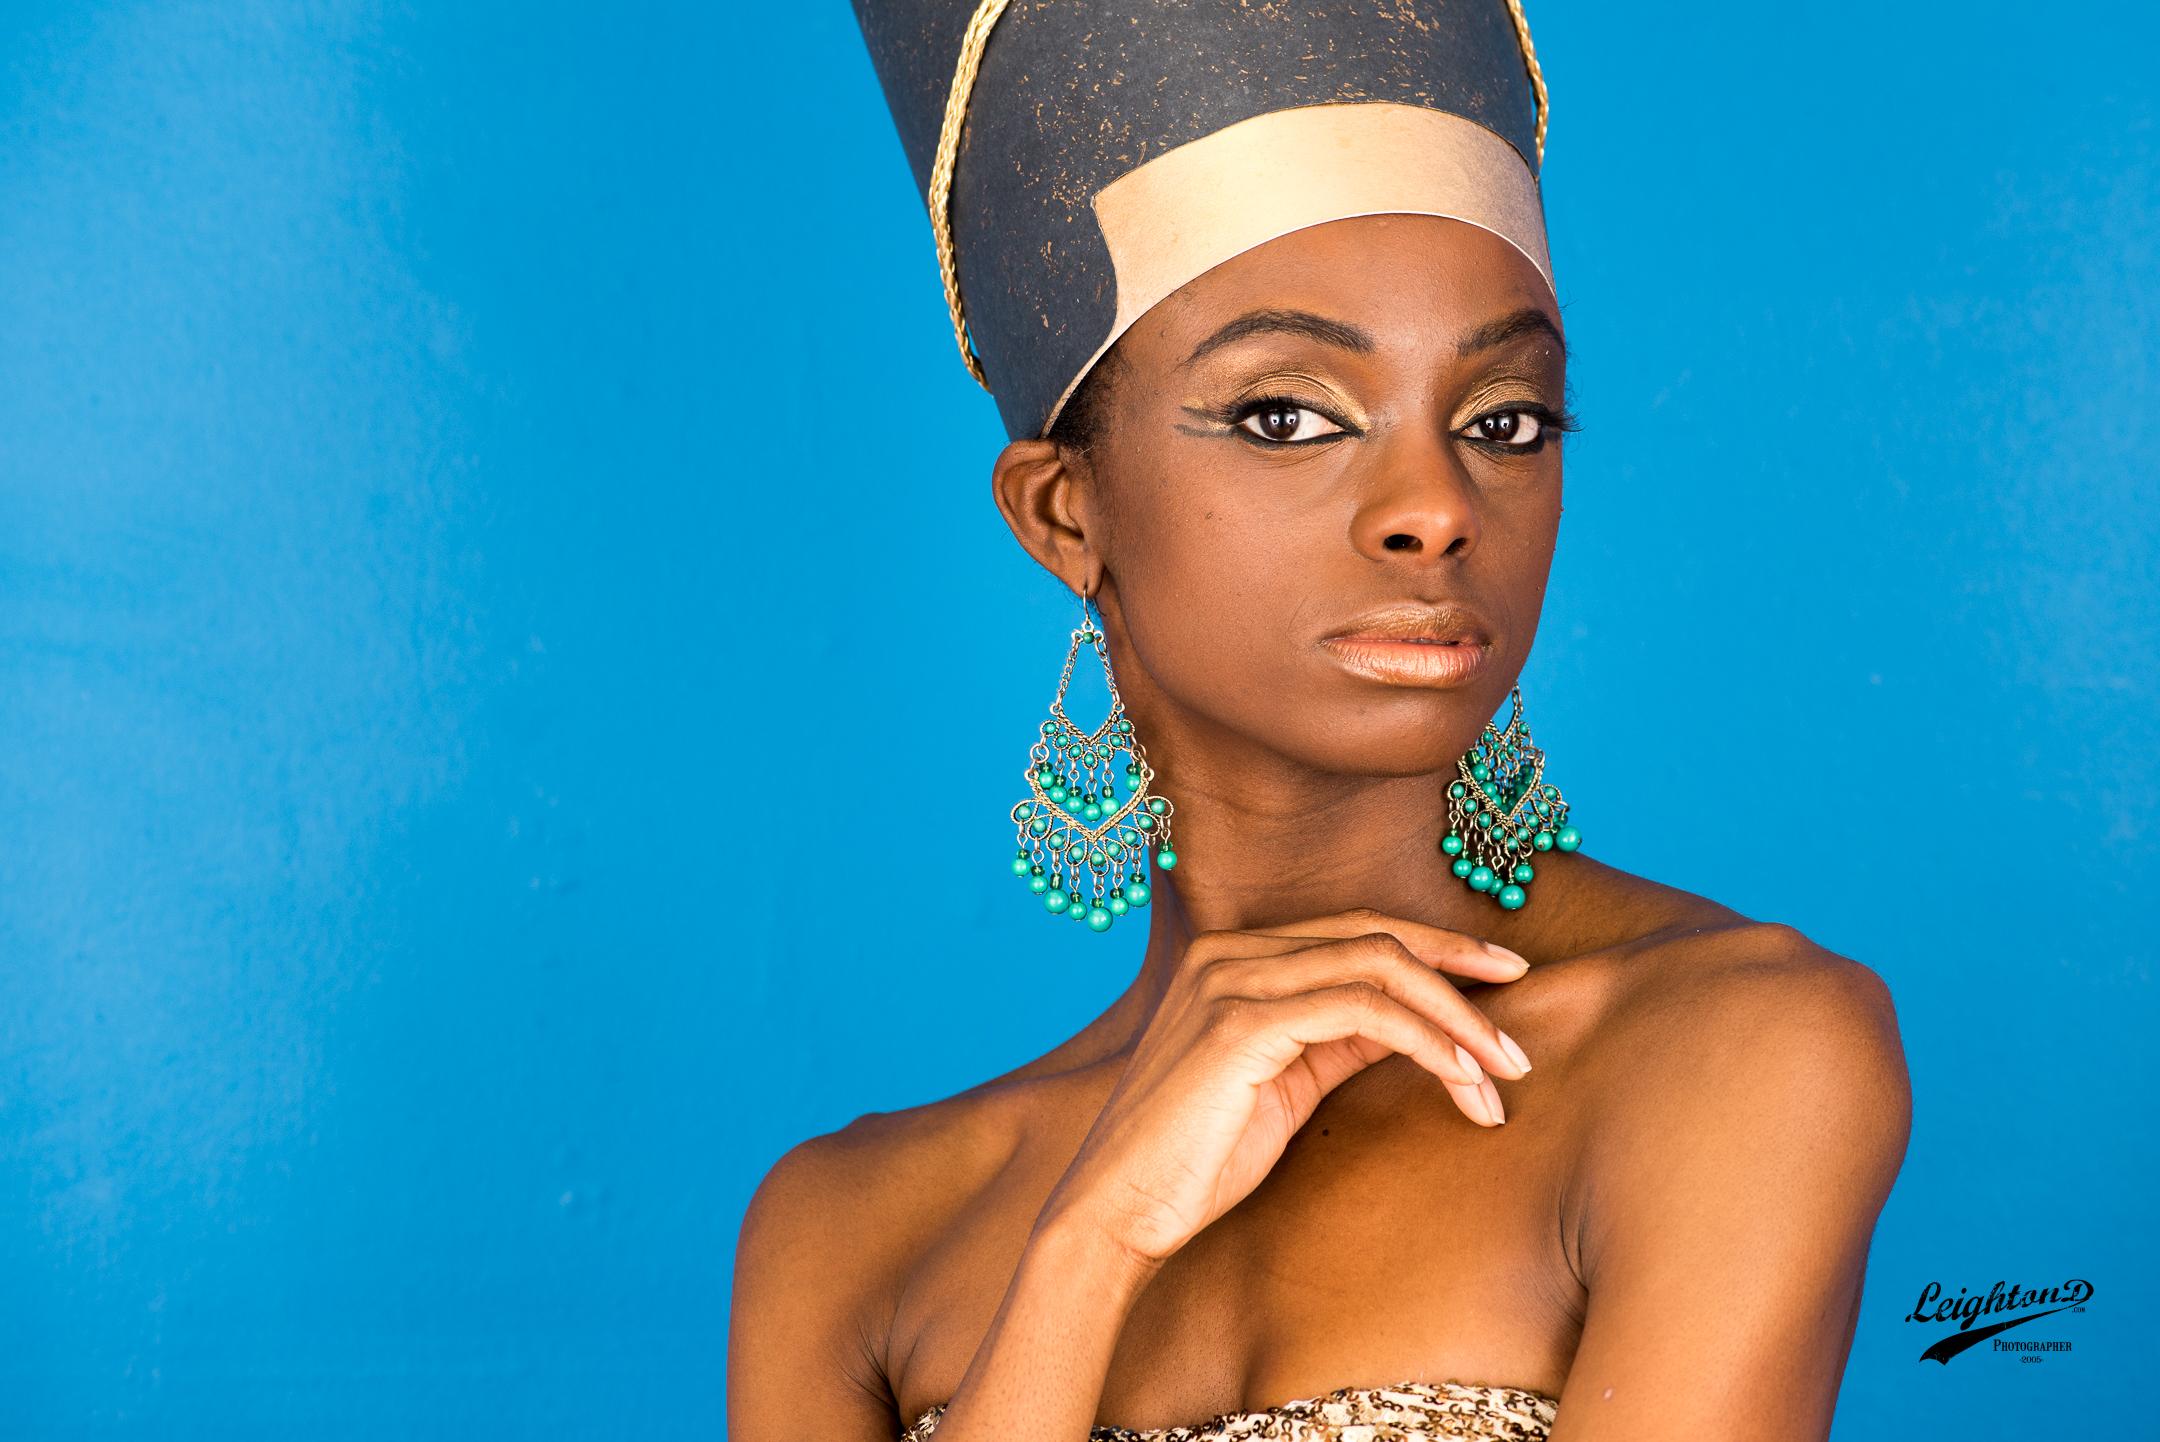 untitled-LeightonD-Shante Nefertiti-5242.jpg